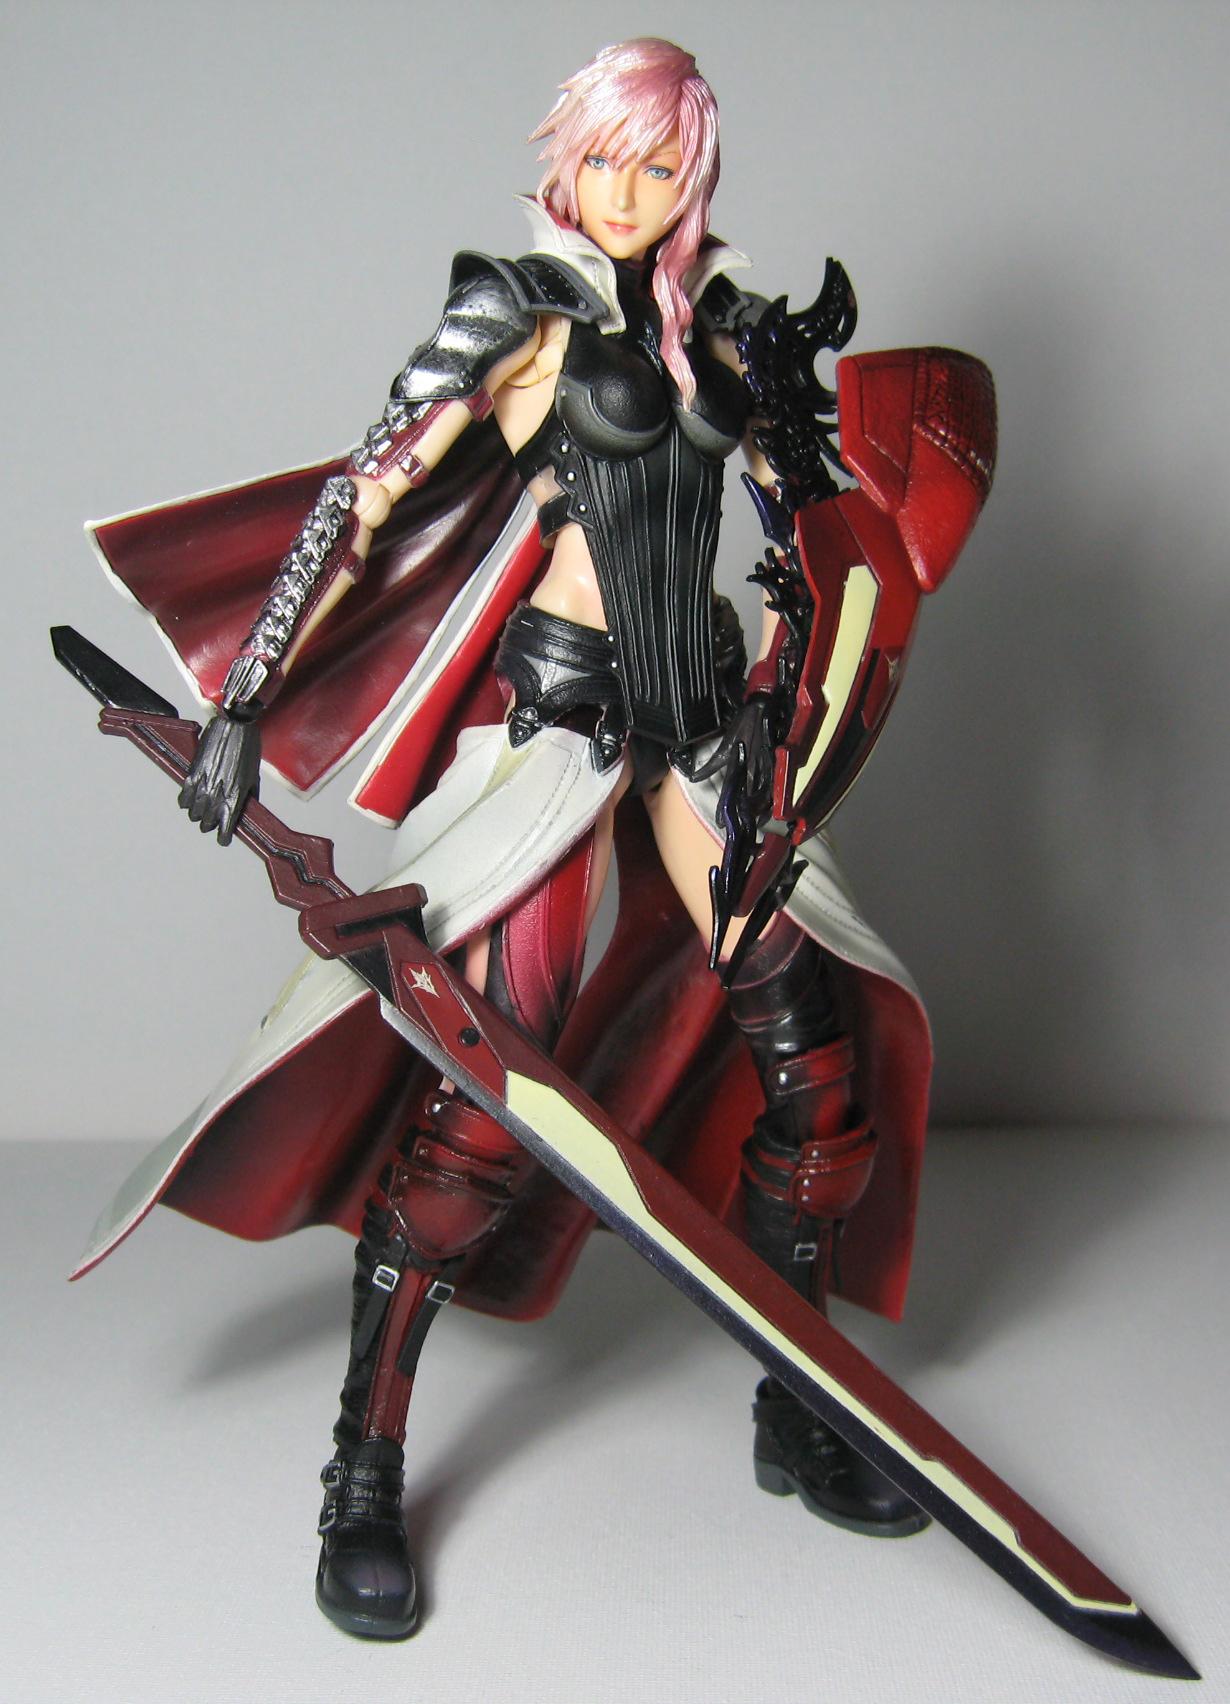 Square Enix Final Fantasy Play Arts Kai Lighting Returns Lighting Figure Rinkya